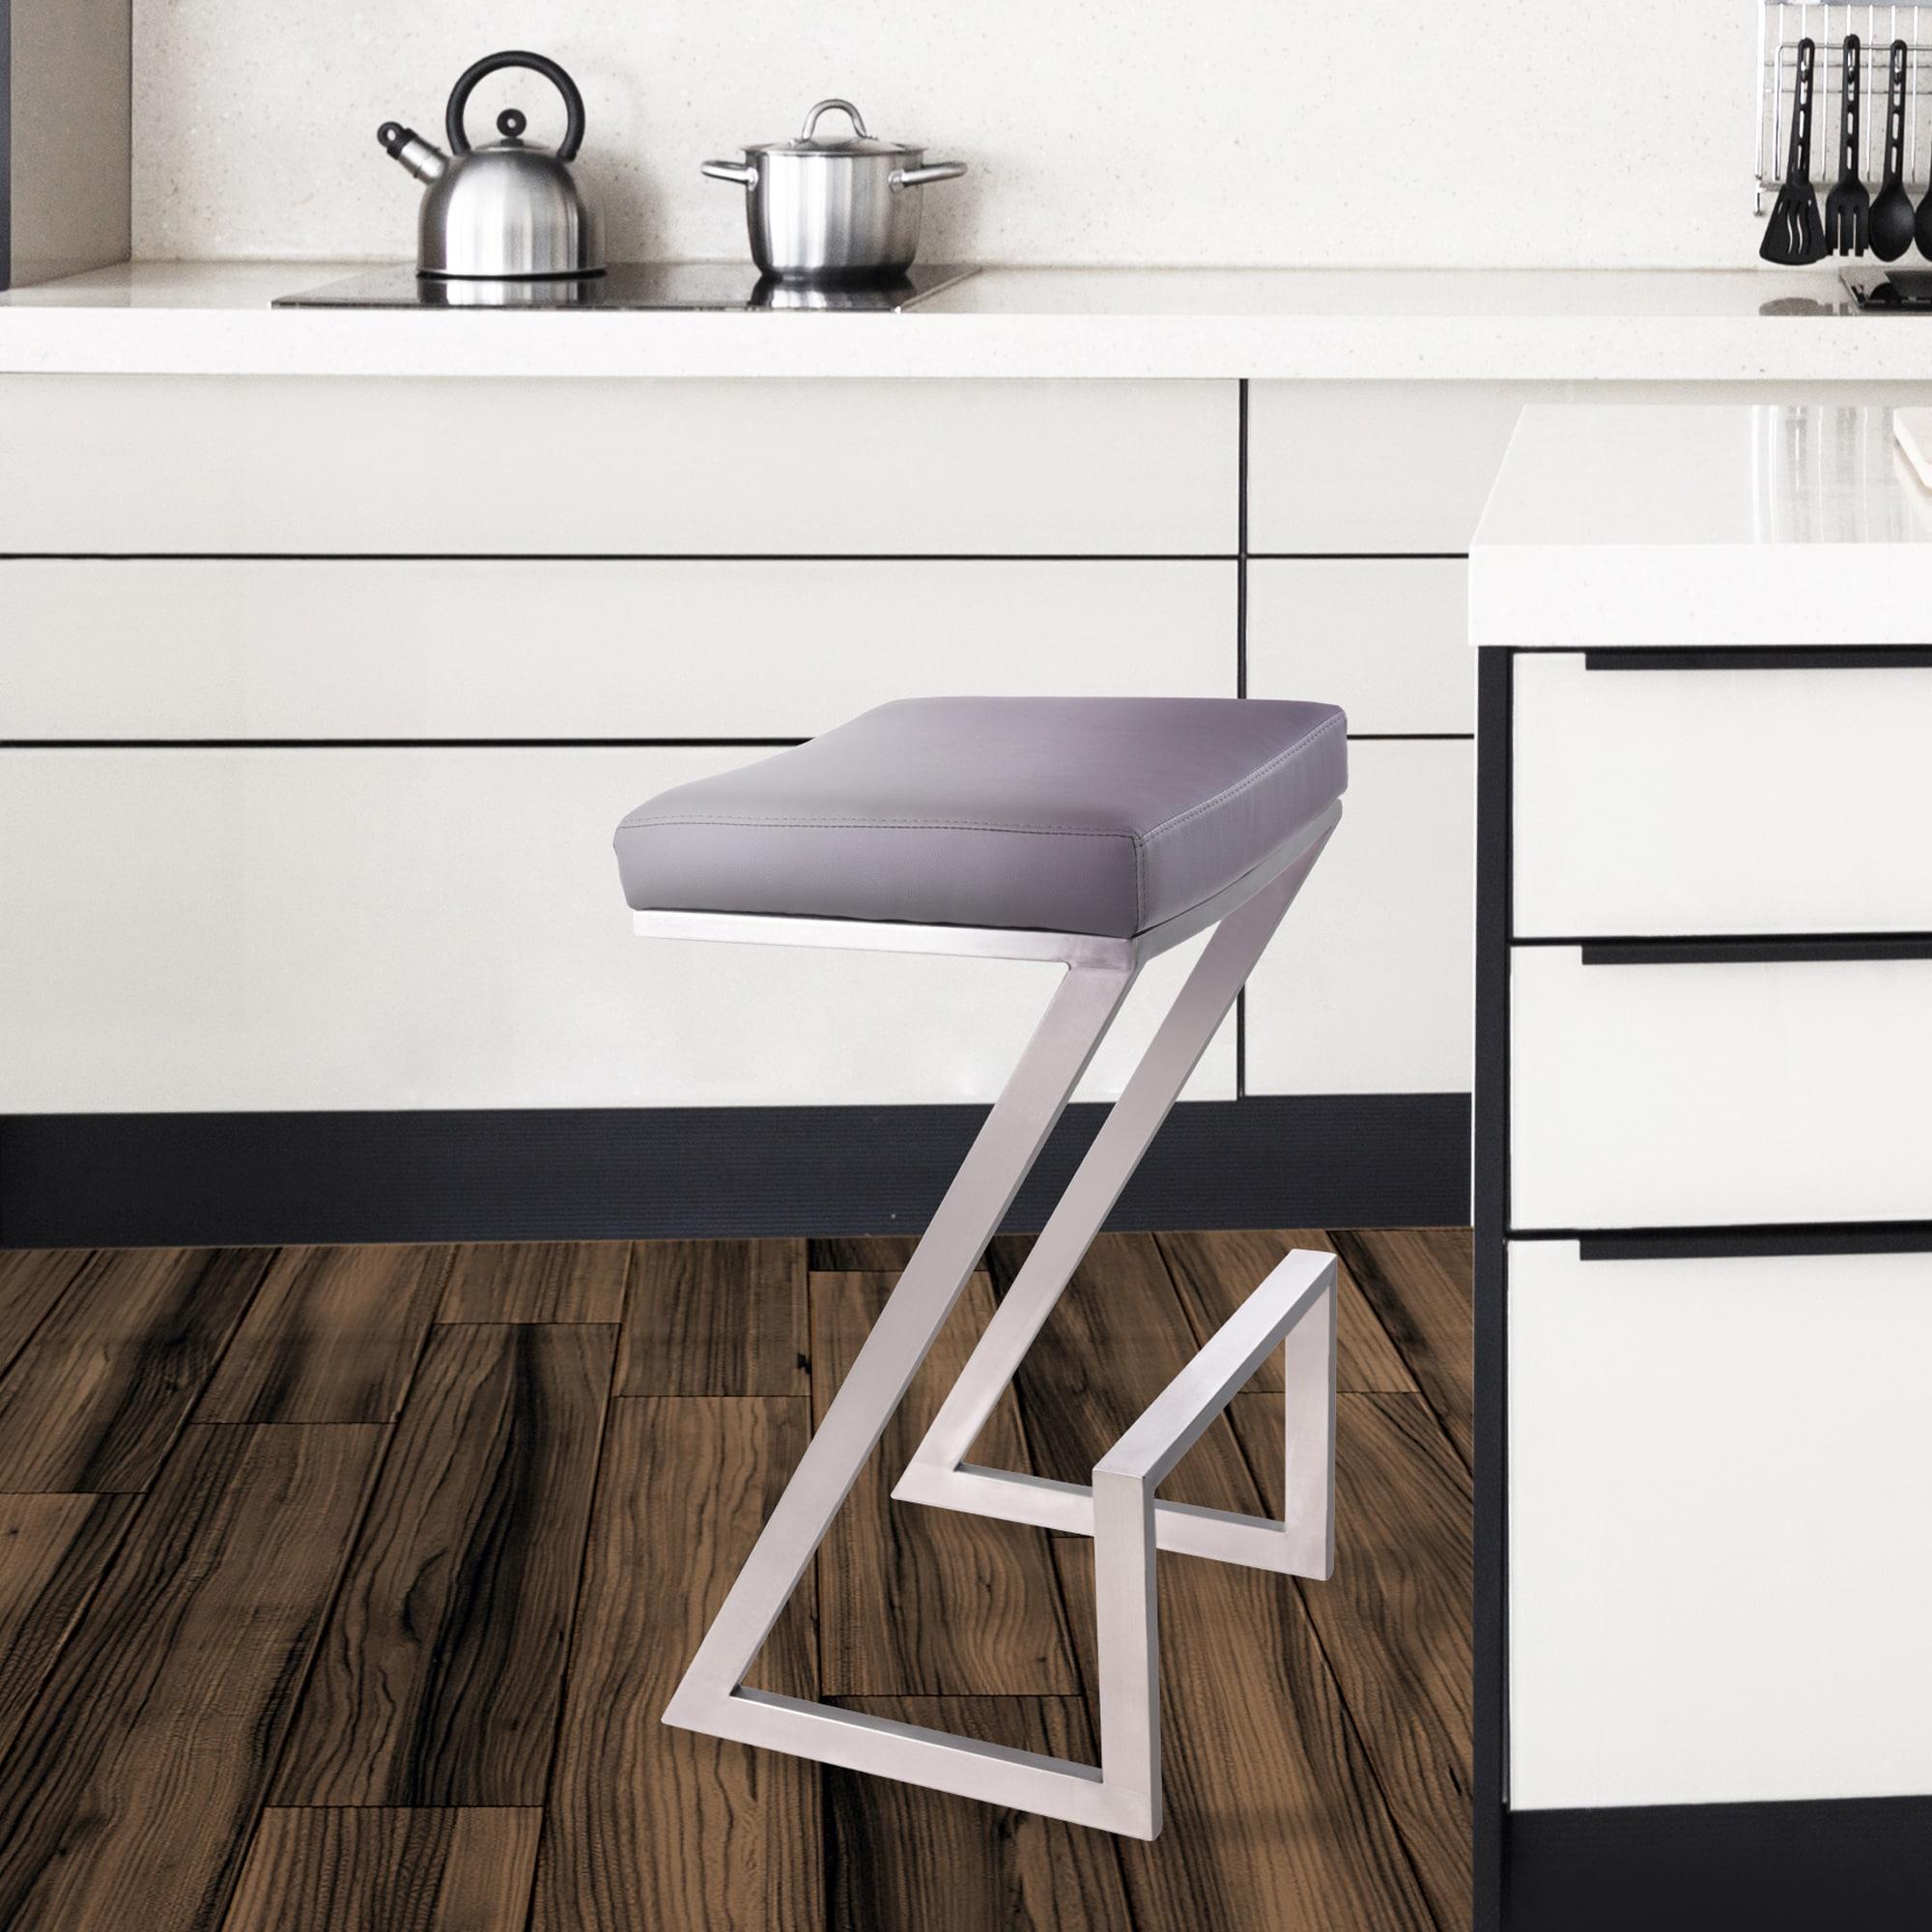 Miraculous Armen Living Atlantis 26 Inch Backless Counter Height Stool Machost Co Dining Chair Design Ideas Machostcouk